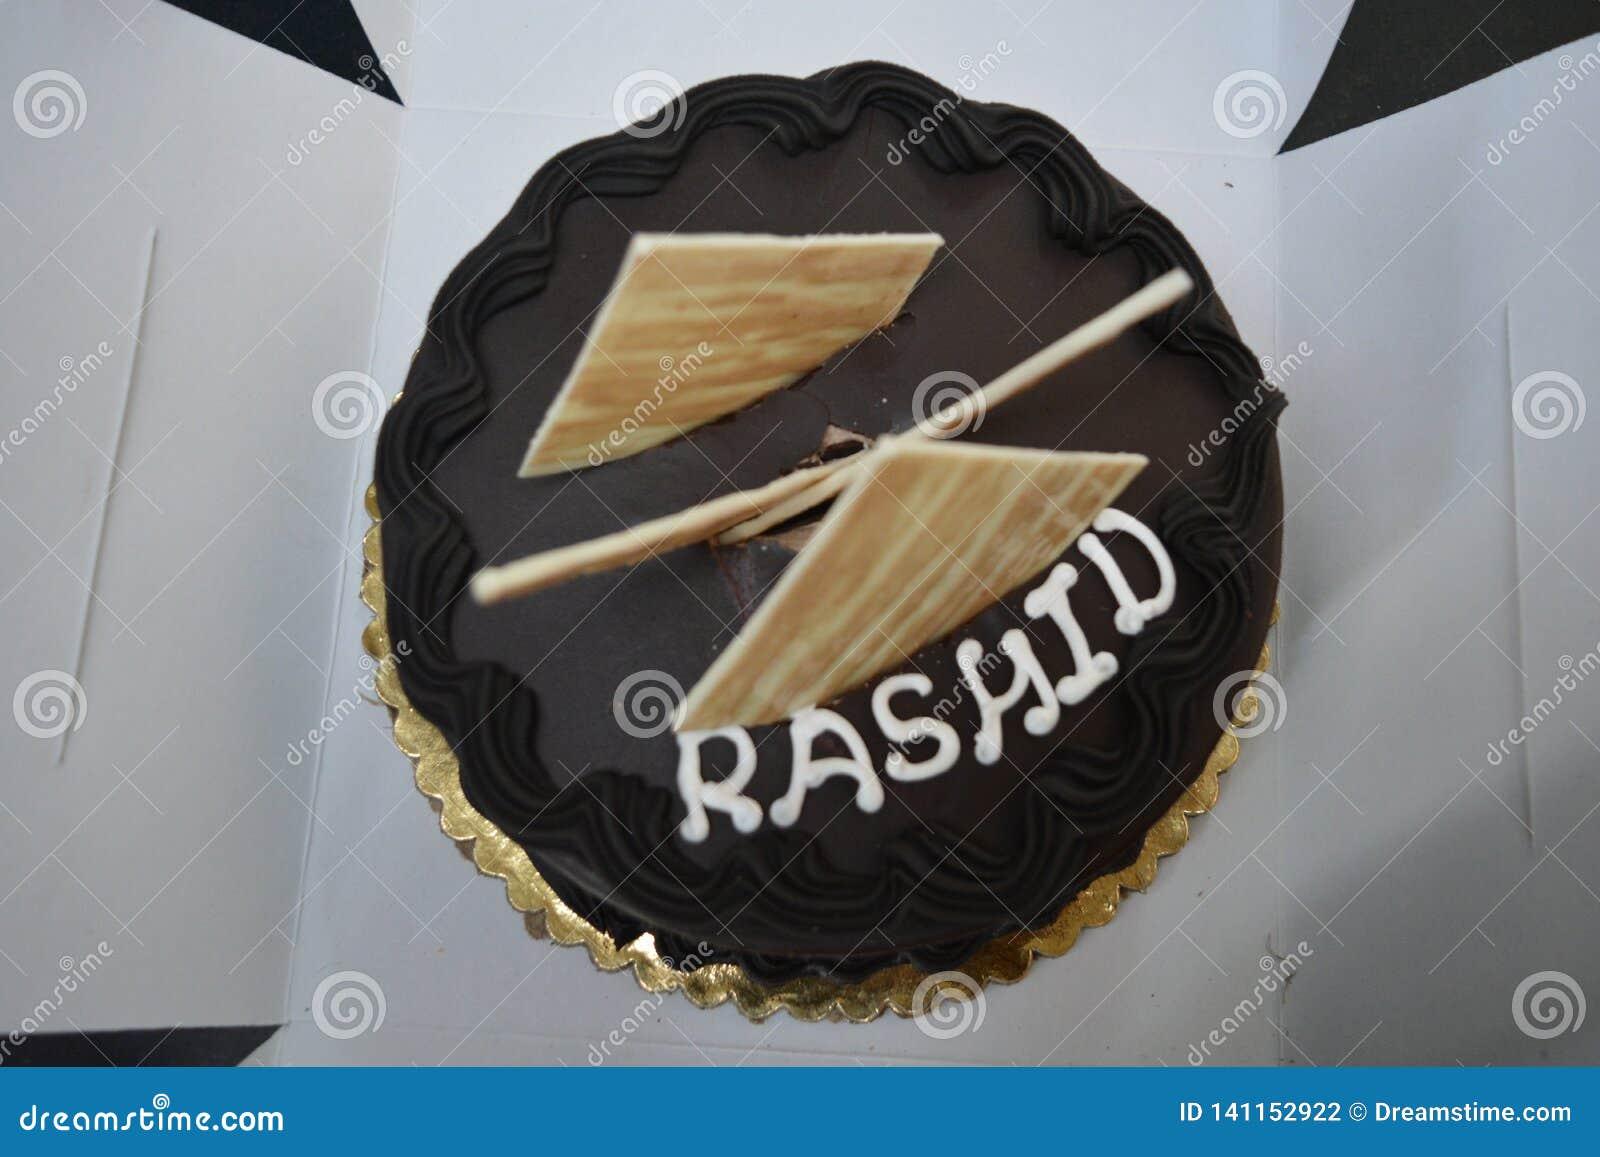 Birthday cake with name Rashid